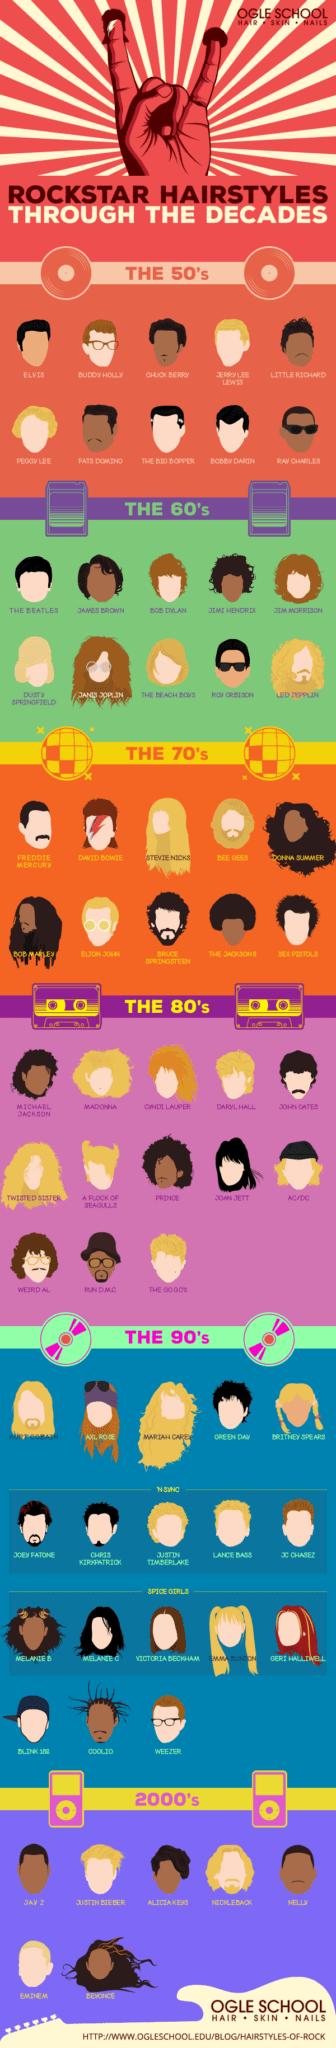 rockstar hairstyles through the decades - cosmetology school